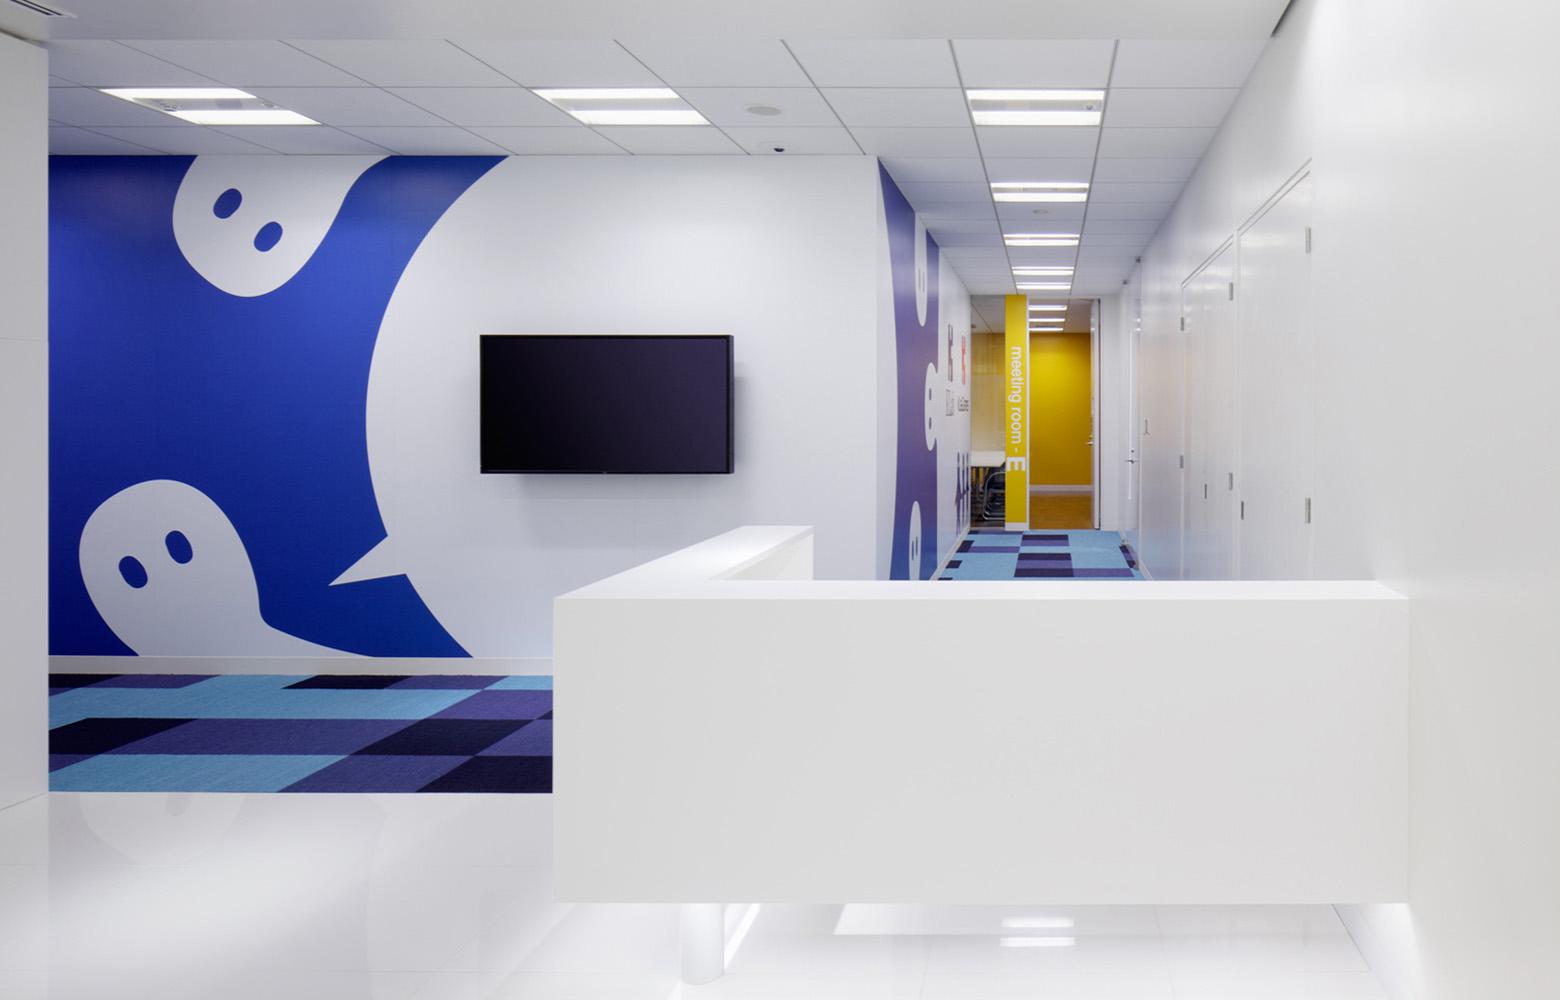 KLab株式会社 Entrance_3 デザイン・レイアウト事例